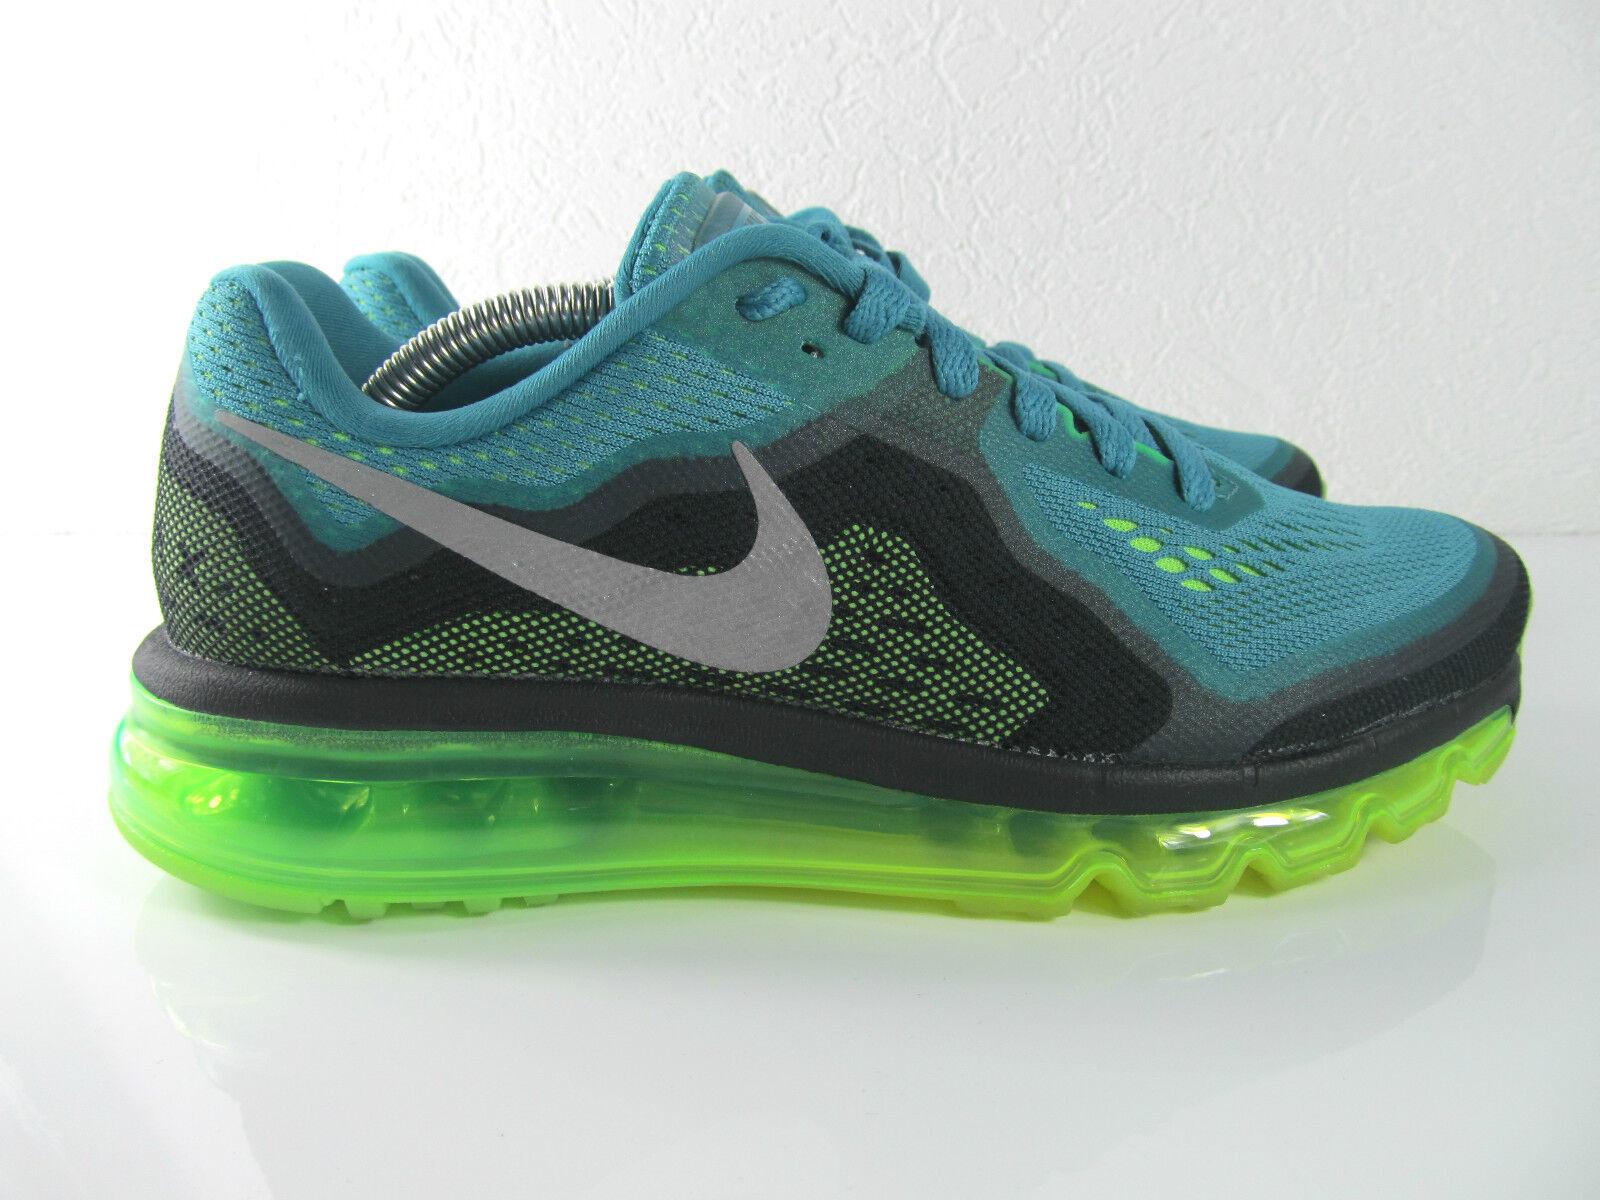 Nike Wmns Running Air Max 2014 Sneakers Running Wmns Grün Silver Lime  Eur 39 US_8 UK 5.5 9c9cc4